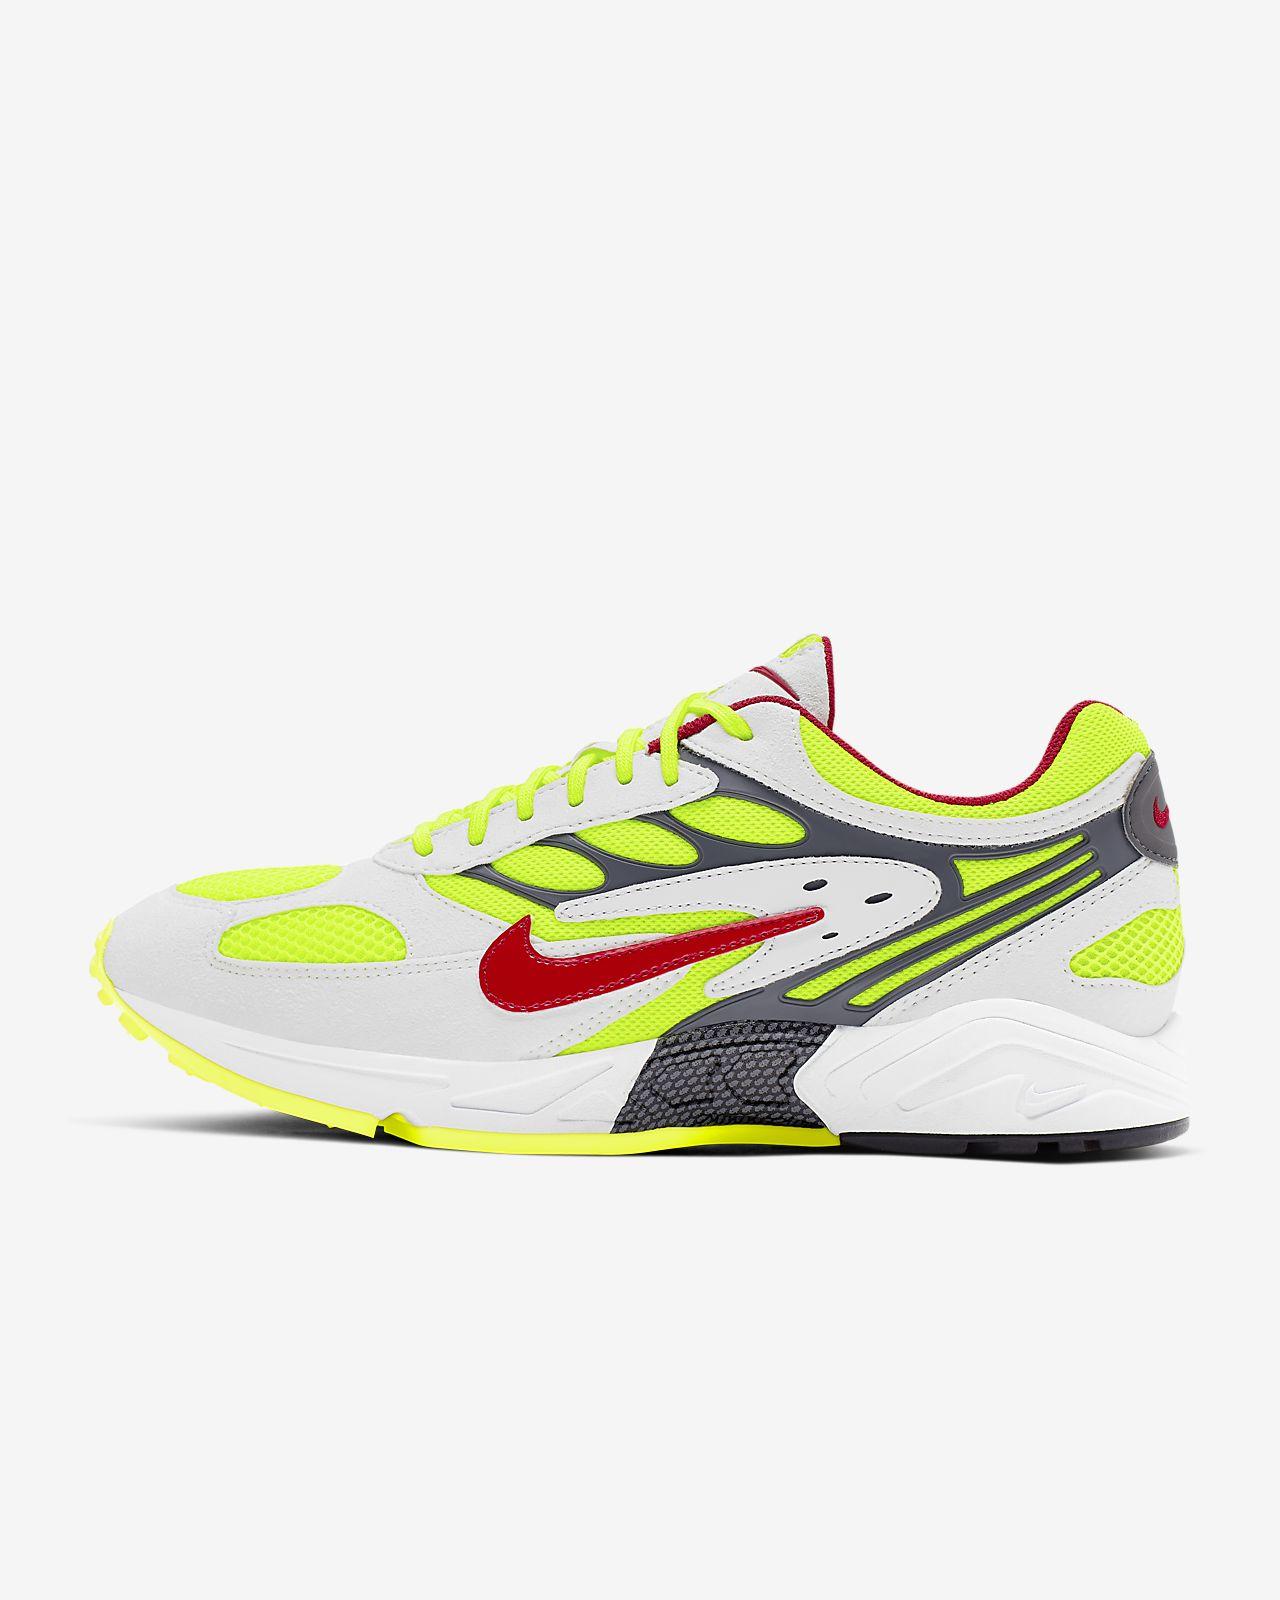 Scarpa Nike Air Ghost Racer - Uomo